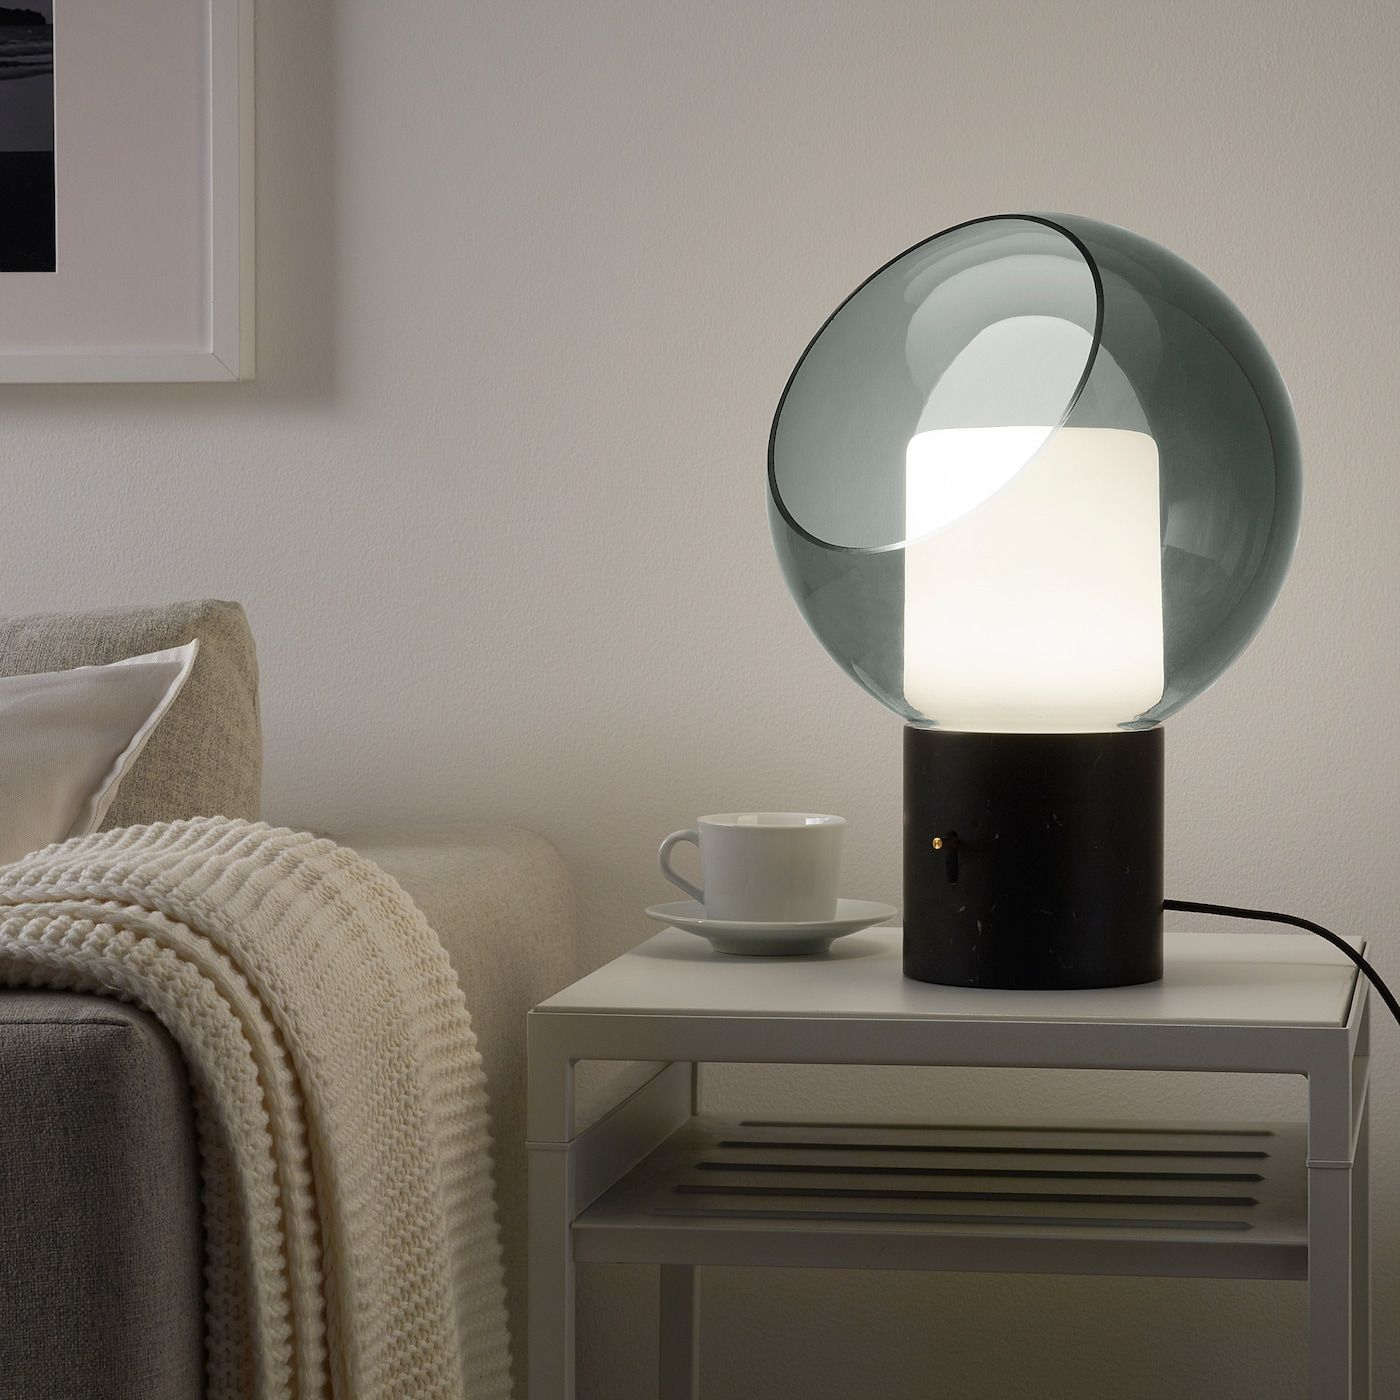 EVEDAL Table lamp, gray marble, globe gray globe IKEA in